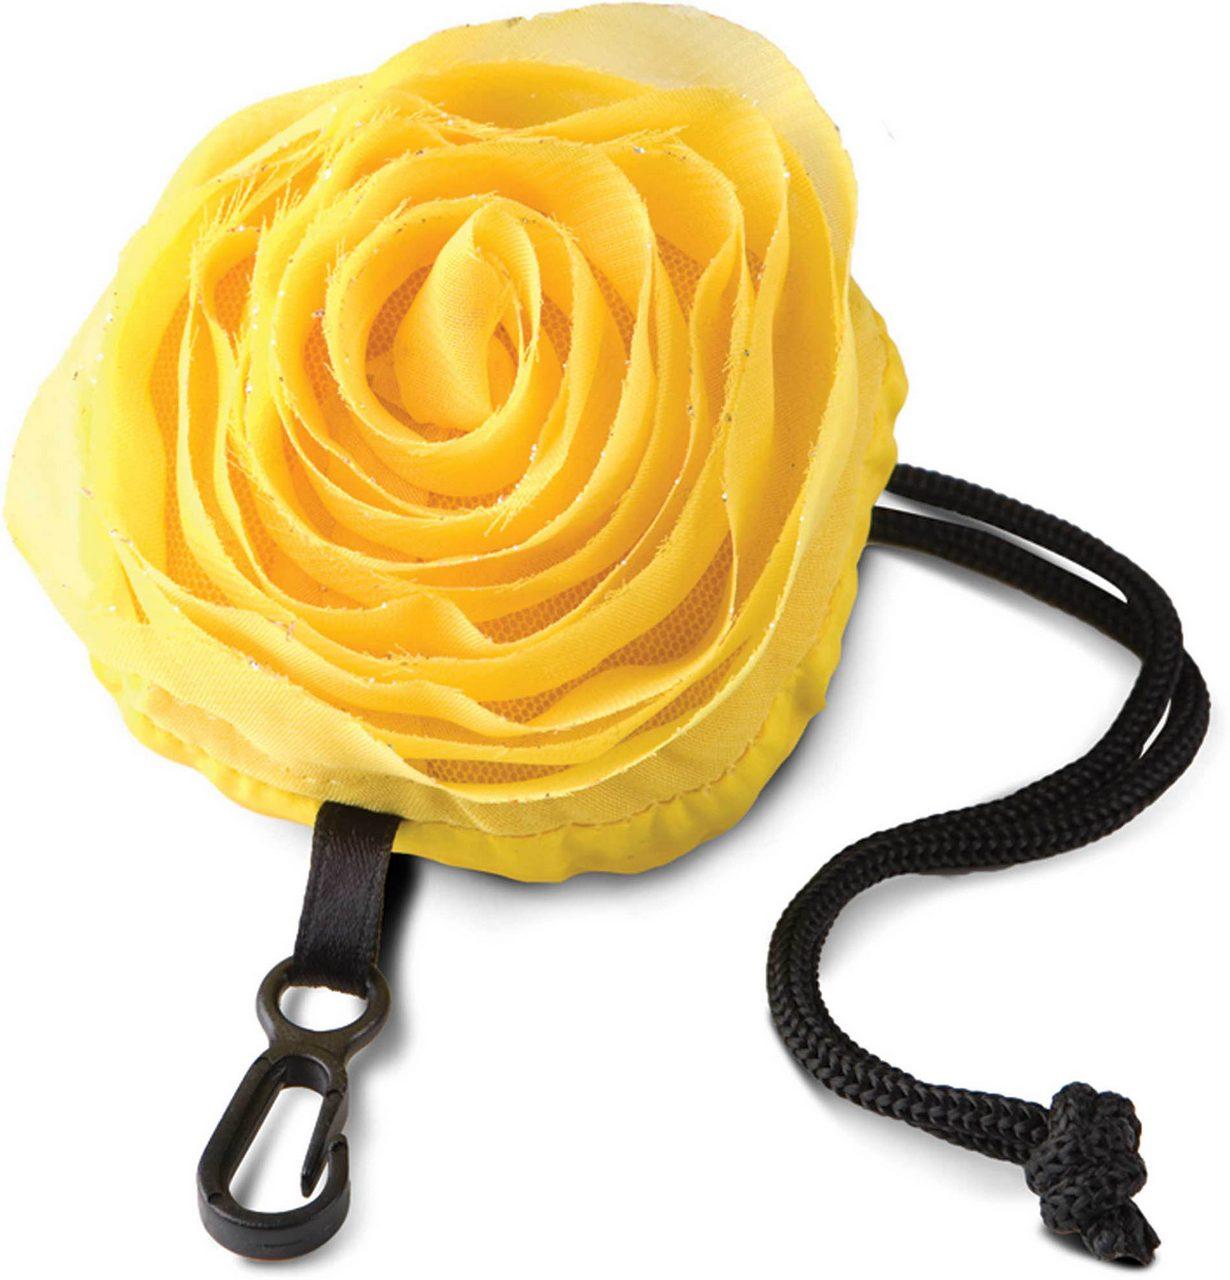 Sacosa KI0202 galbena trandafir Sacose bumbac poliester strangere cumparaturi personalizate manere lungi DTG termotransfer broderie serigrafie canvas